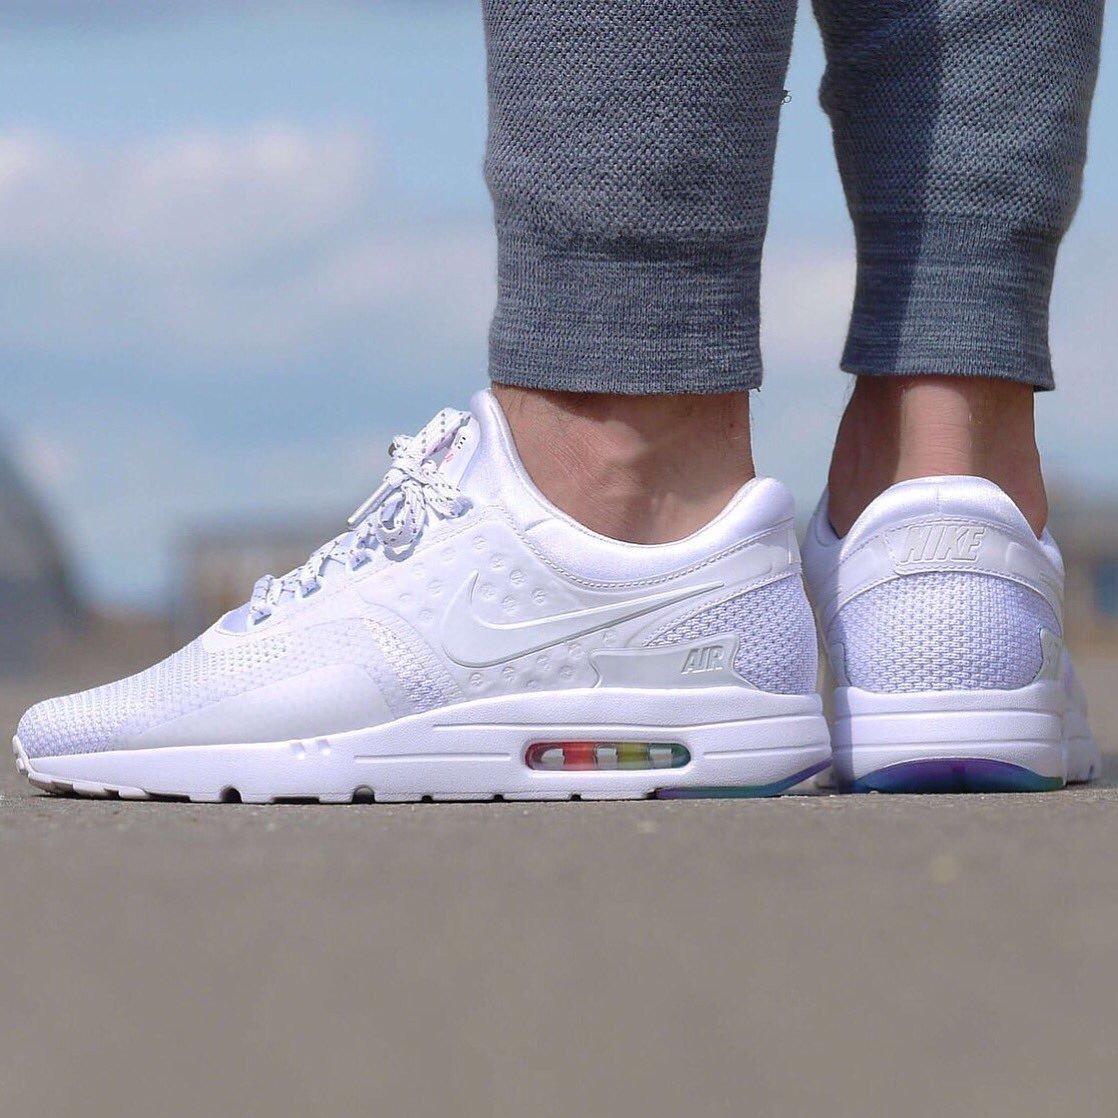 Nike Air Max Zero Be True White & Colors Dama Envio Gratis